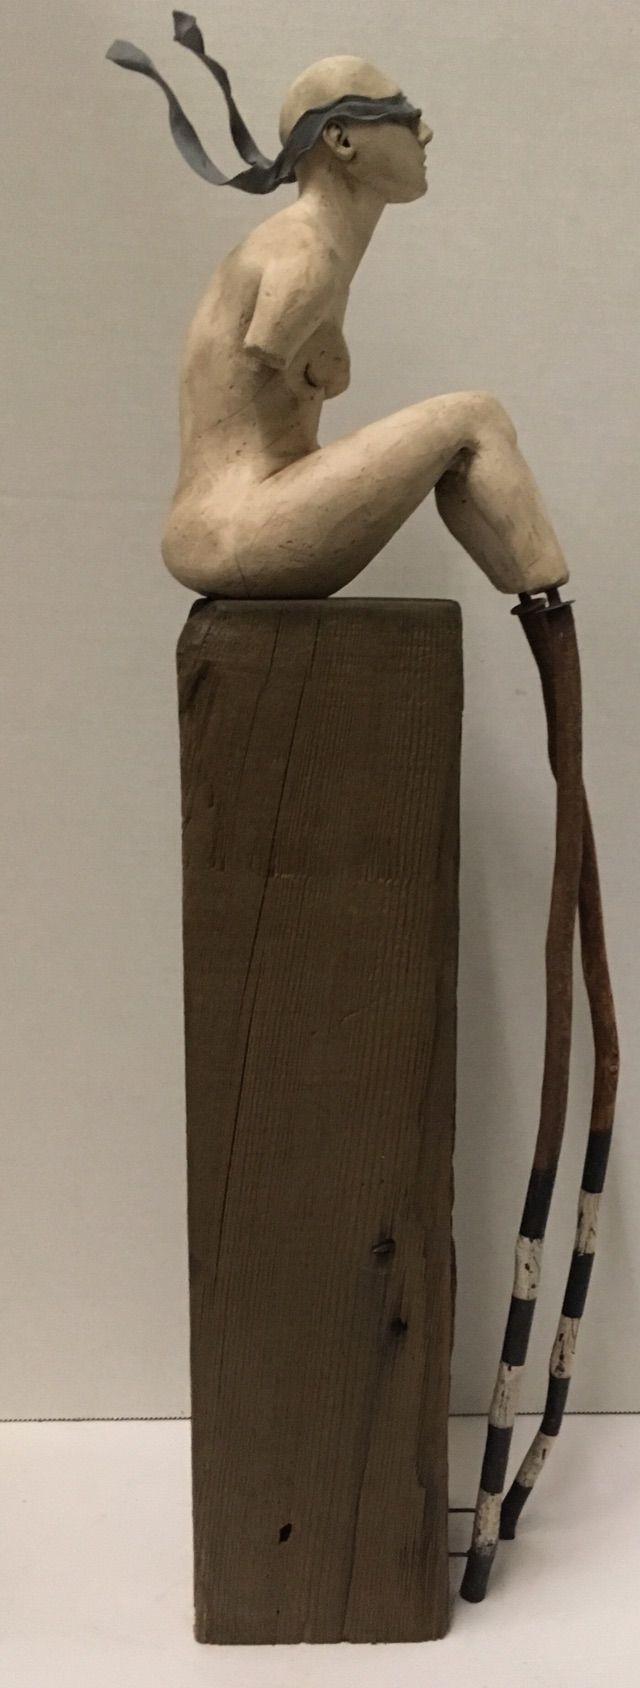 edge wip, ceramic,wood, epoxy - art - catherinechambers | ello